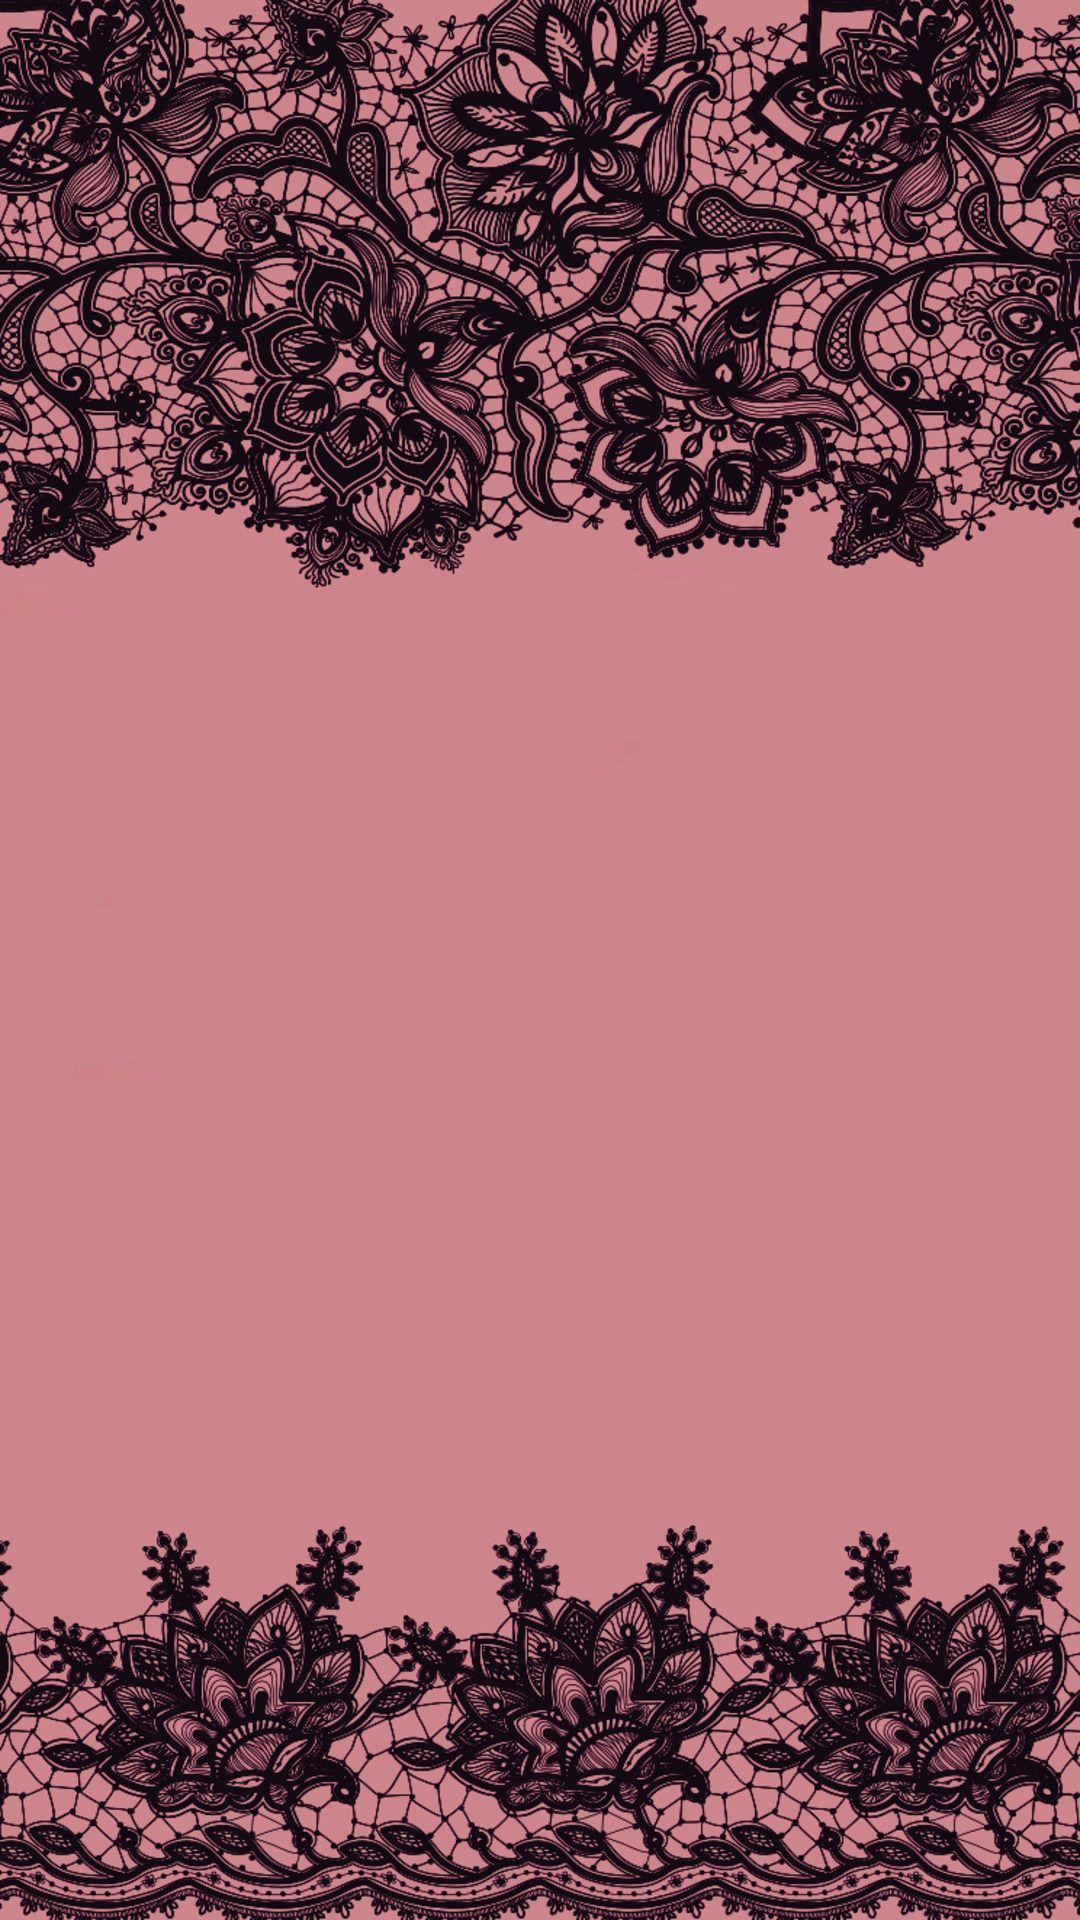 Pin By Pandora On Lace Lace Wallpaper Backgrounds Phone Wallpapers Iphone Wallpaper